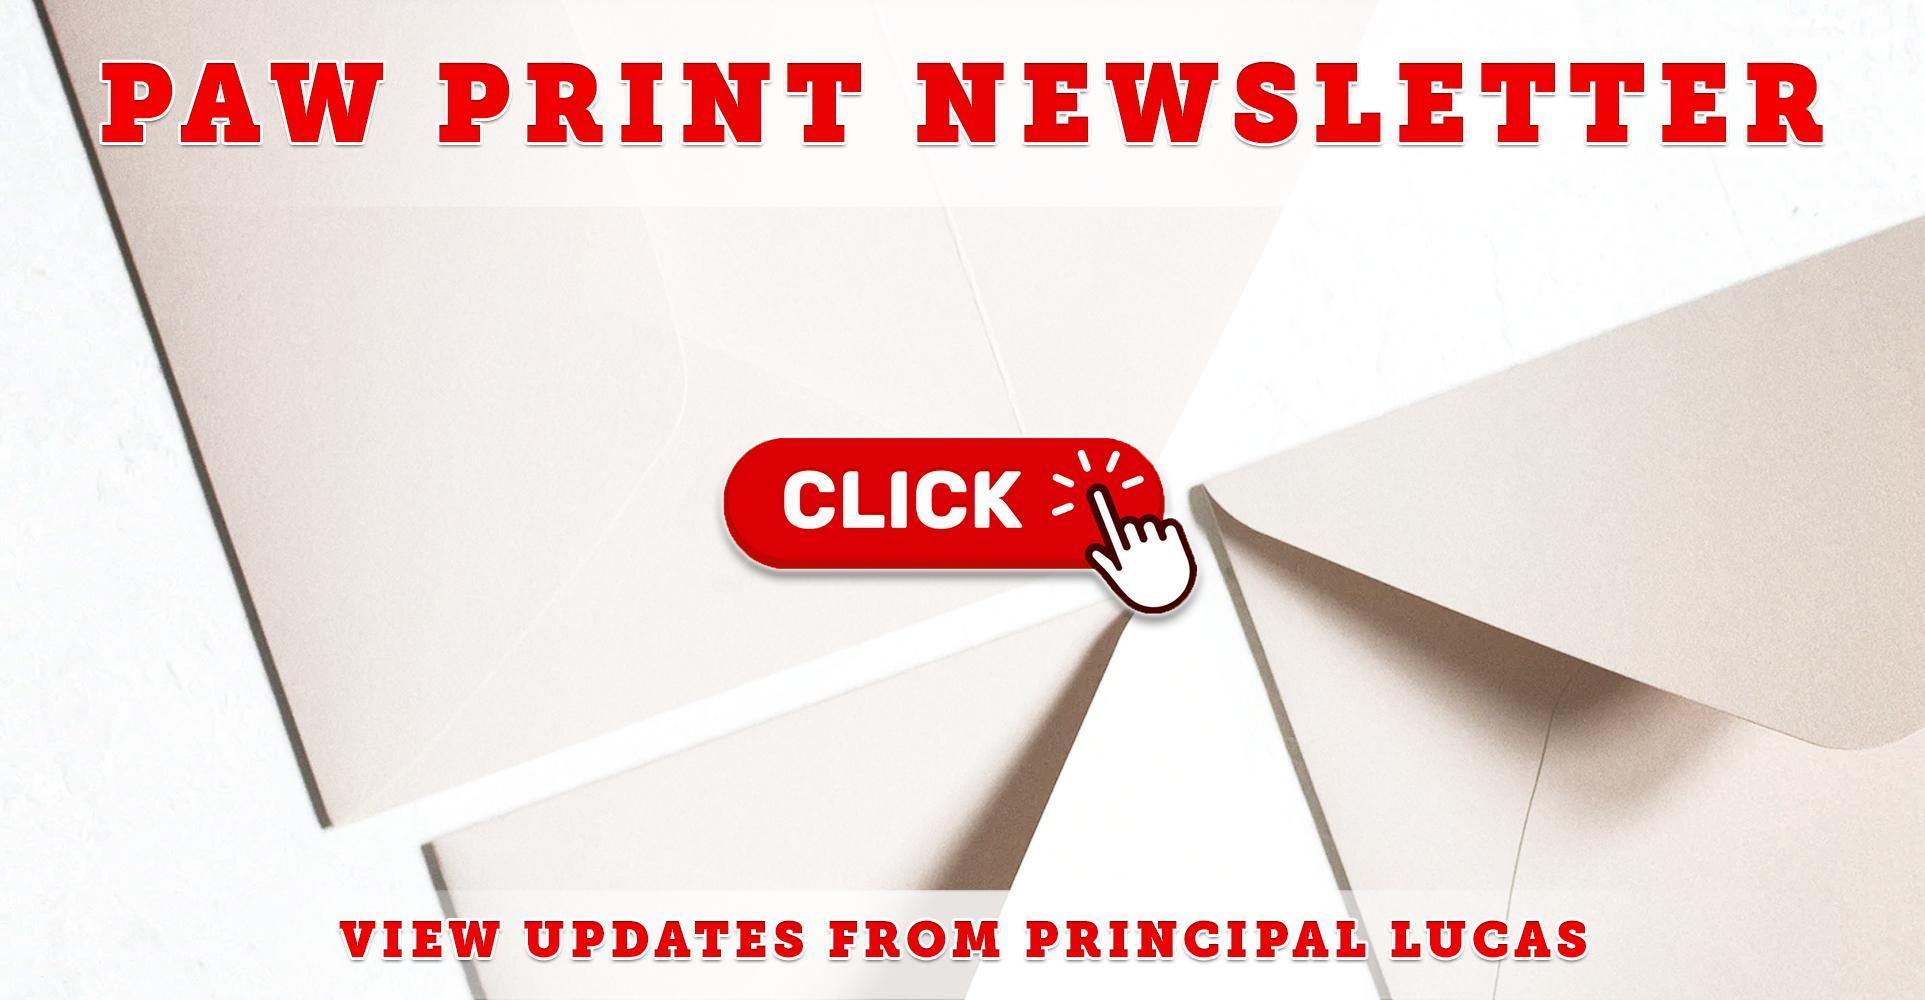 Paw Print Newsletter